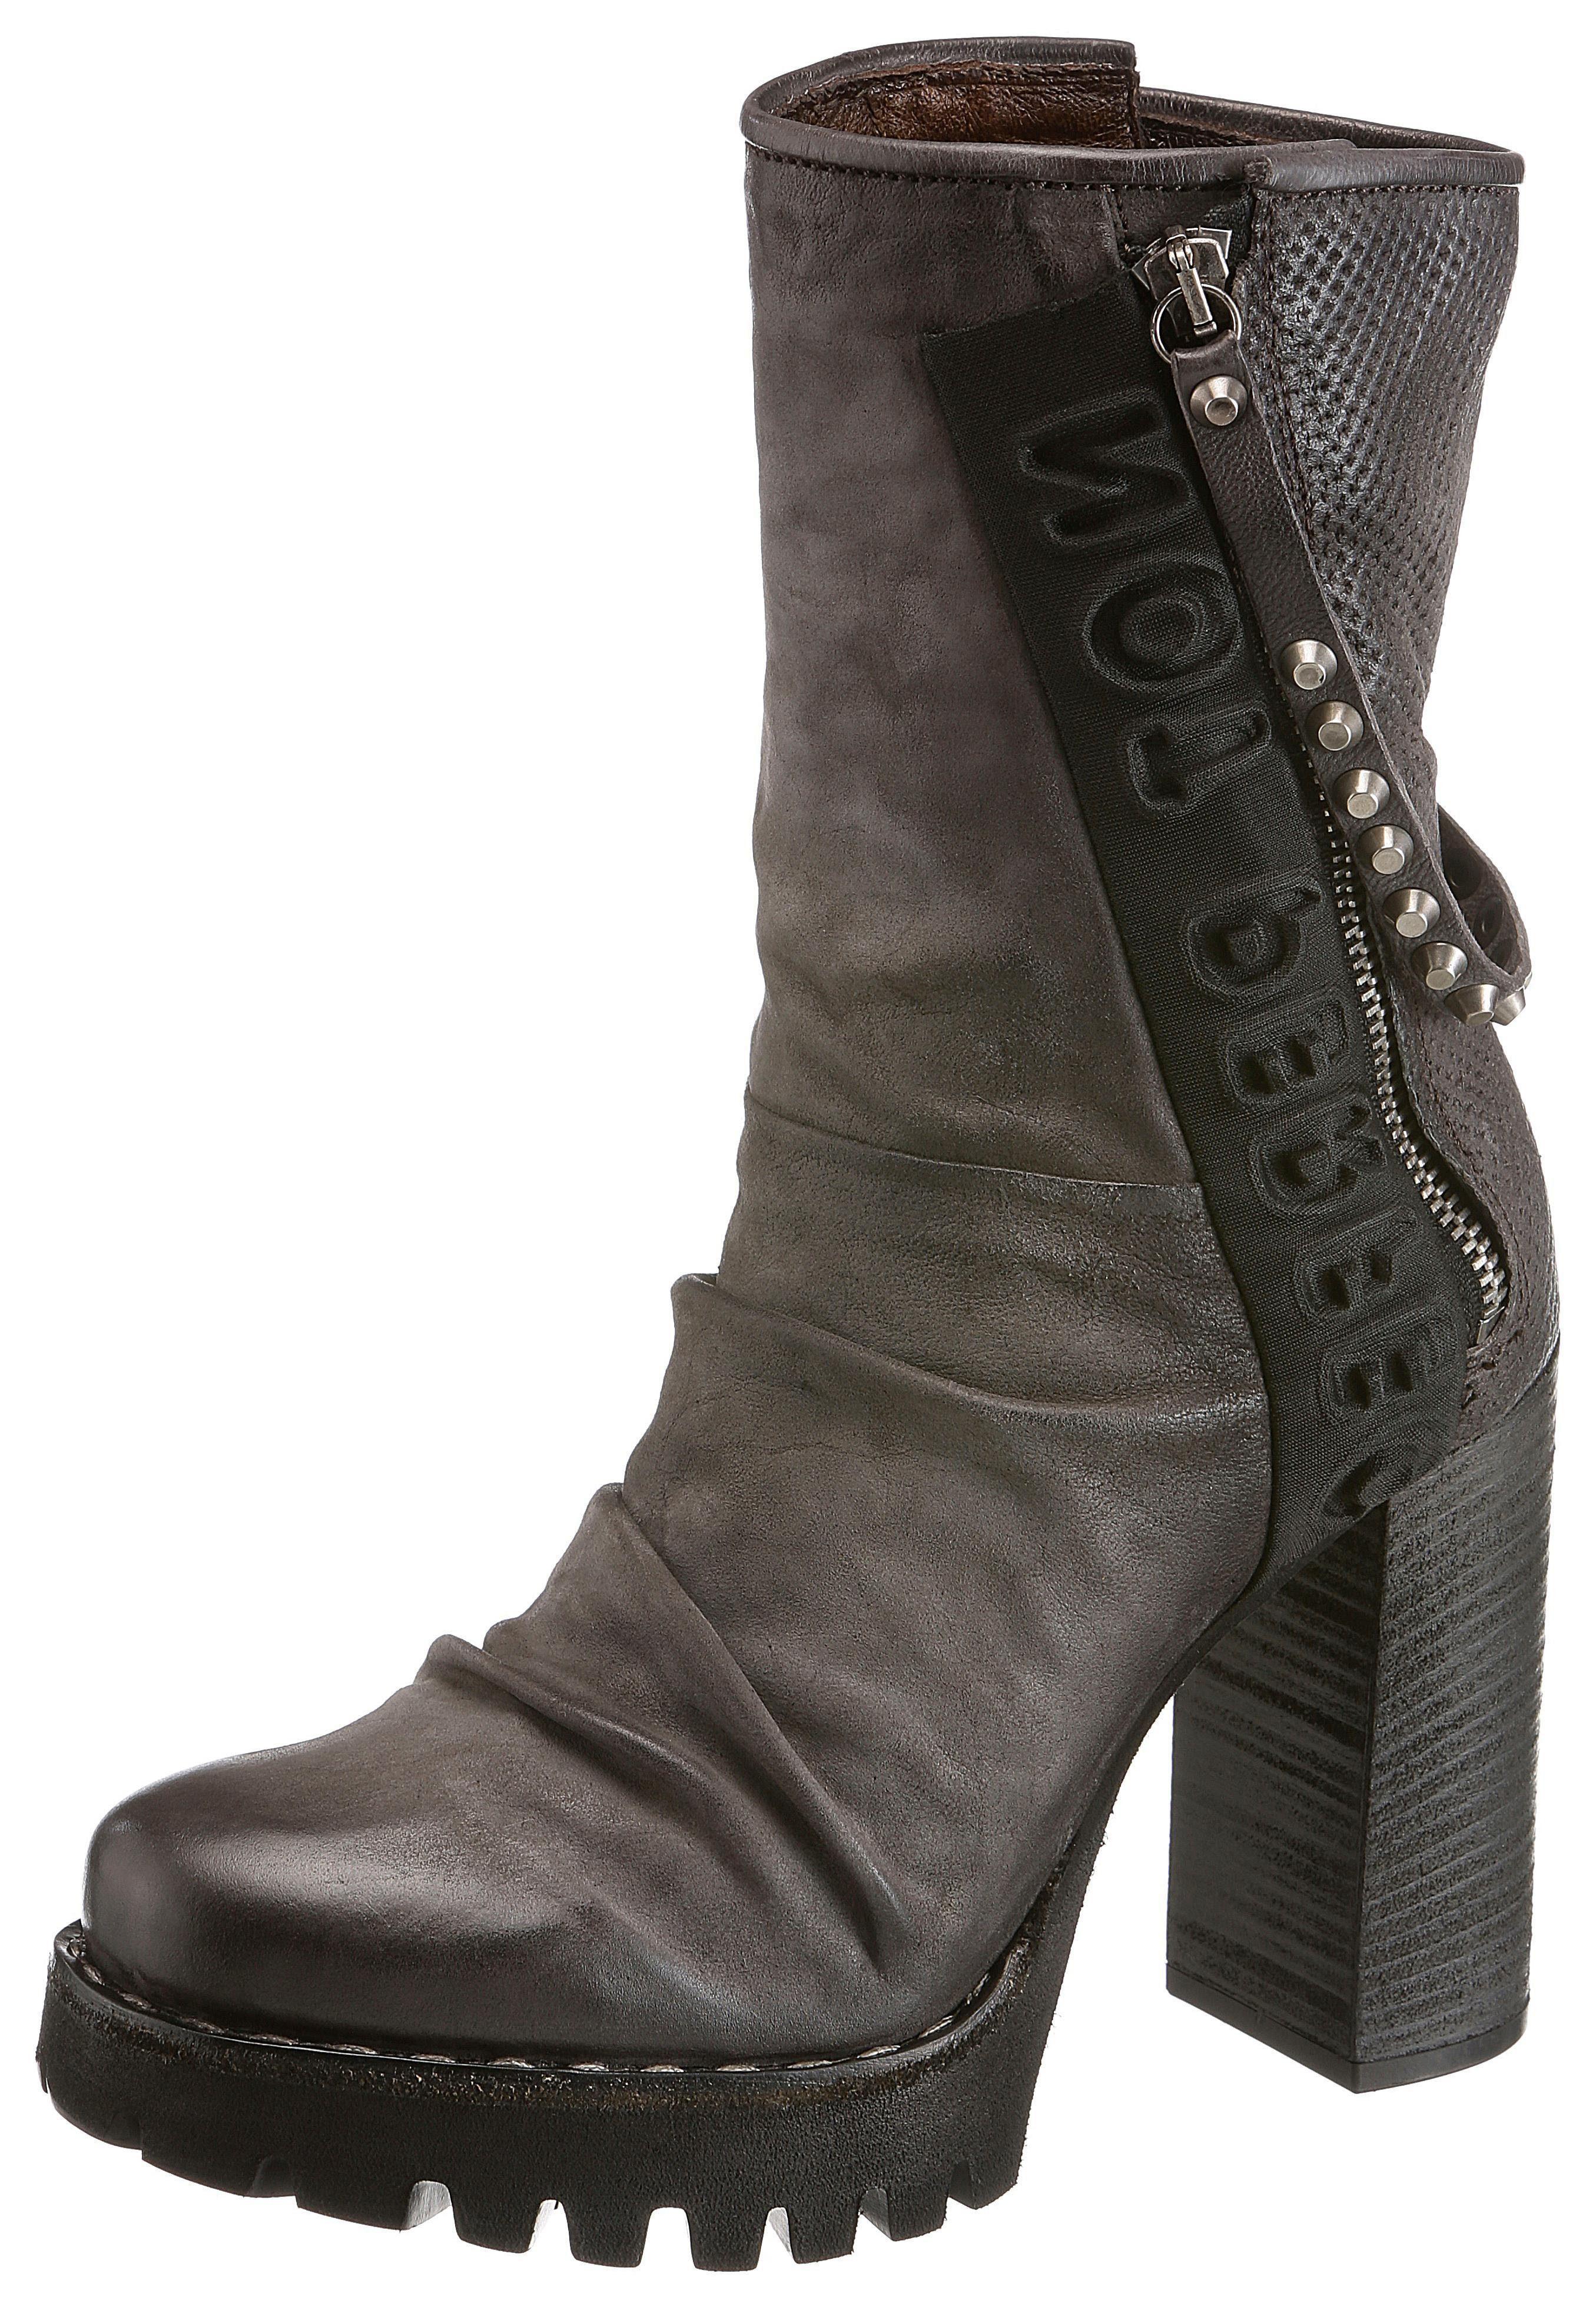 AS98 High-Heel-Stiefelette, mit Perforation  grau